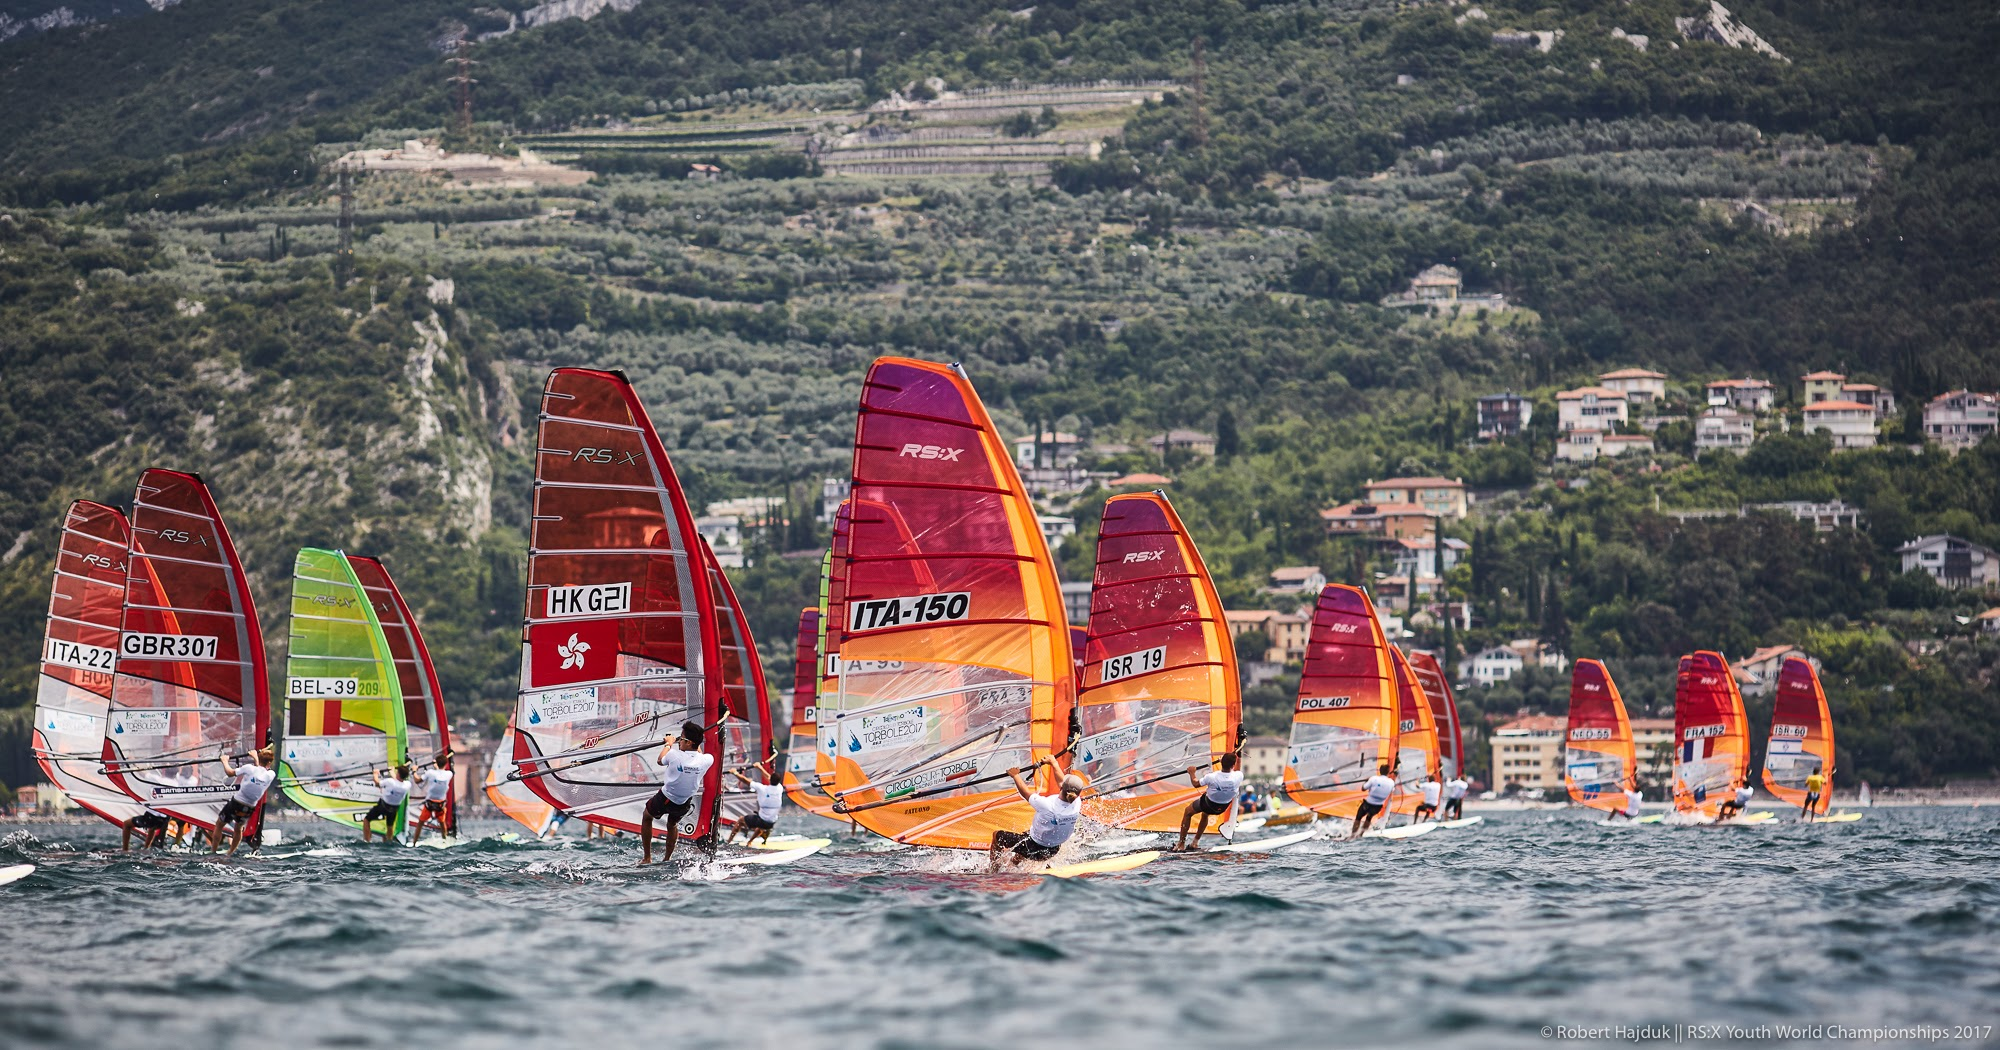 2017 RS:X Youth World Championships || 2017-06-28, Torbole, Lake Garda, Italy || © Copyright 2017 || RS:X Class: Robert Hajduk - ShutterSail.com || All Rights Reserved || srcset=